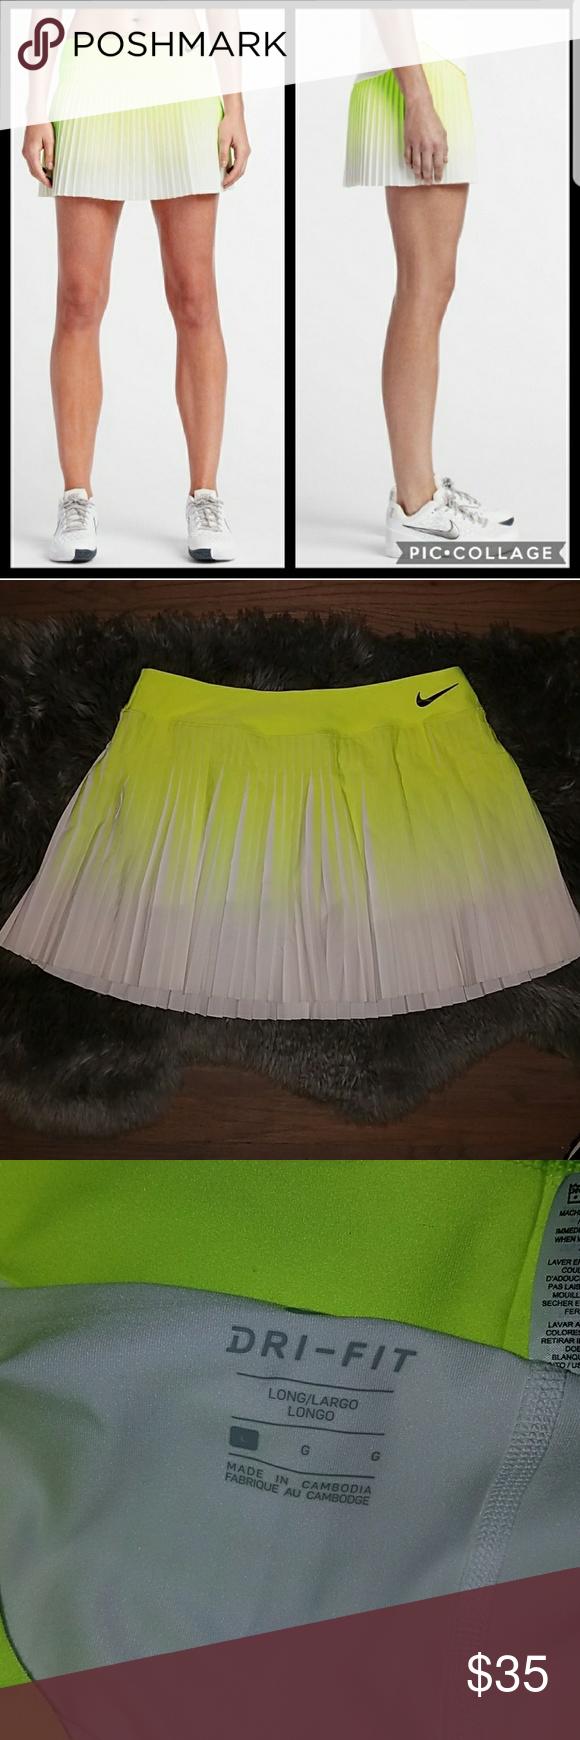 Nike Court Flex Victory Tennis Skirt Tennis Skirt Skirts Nike Skirts